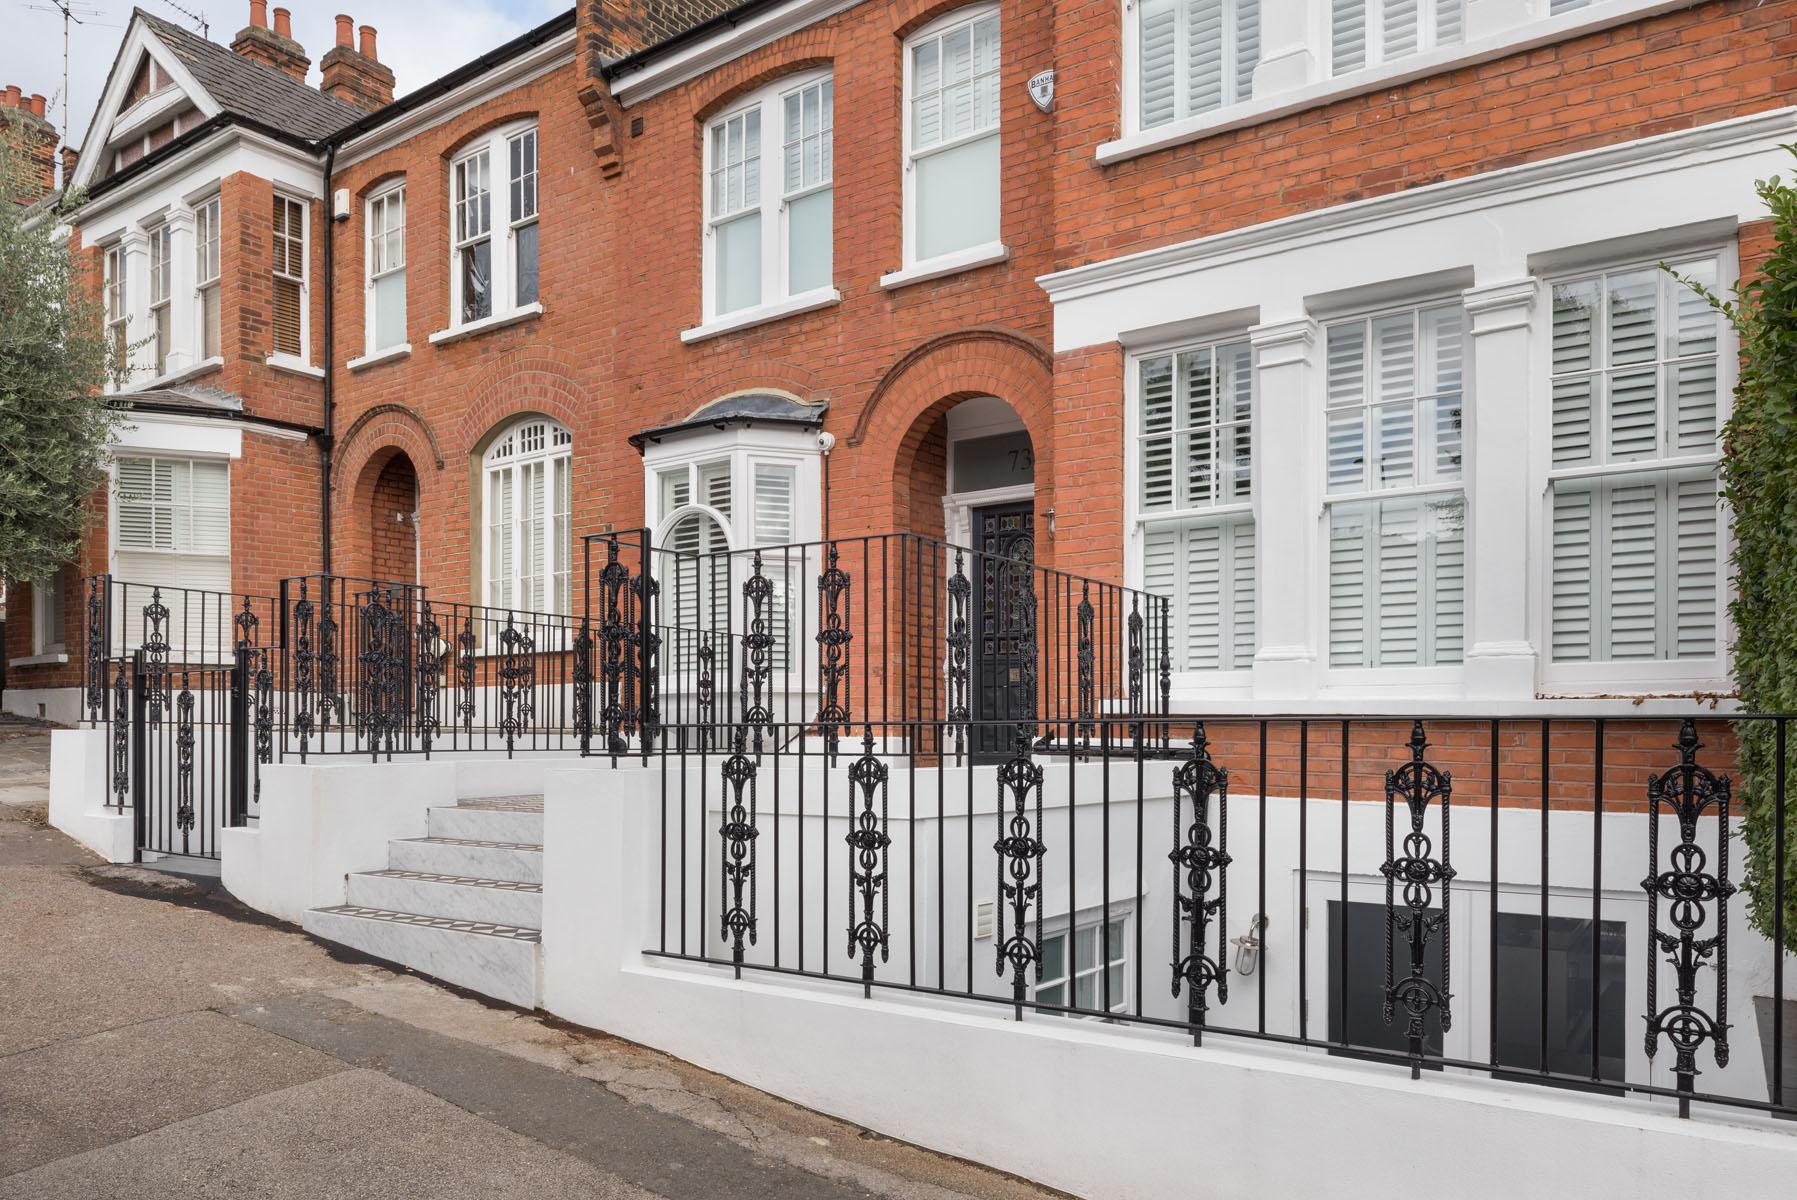 External cast iron railings